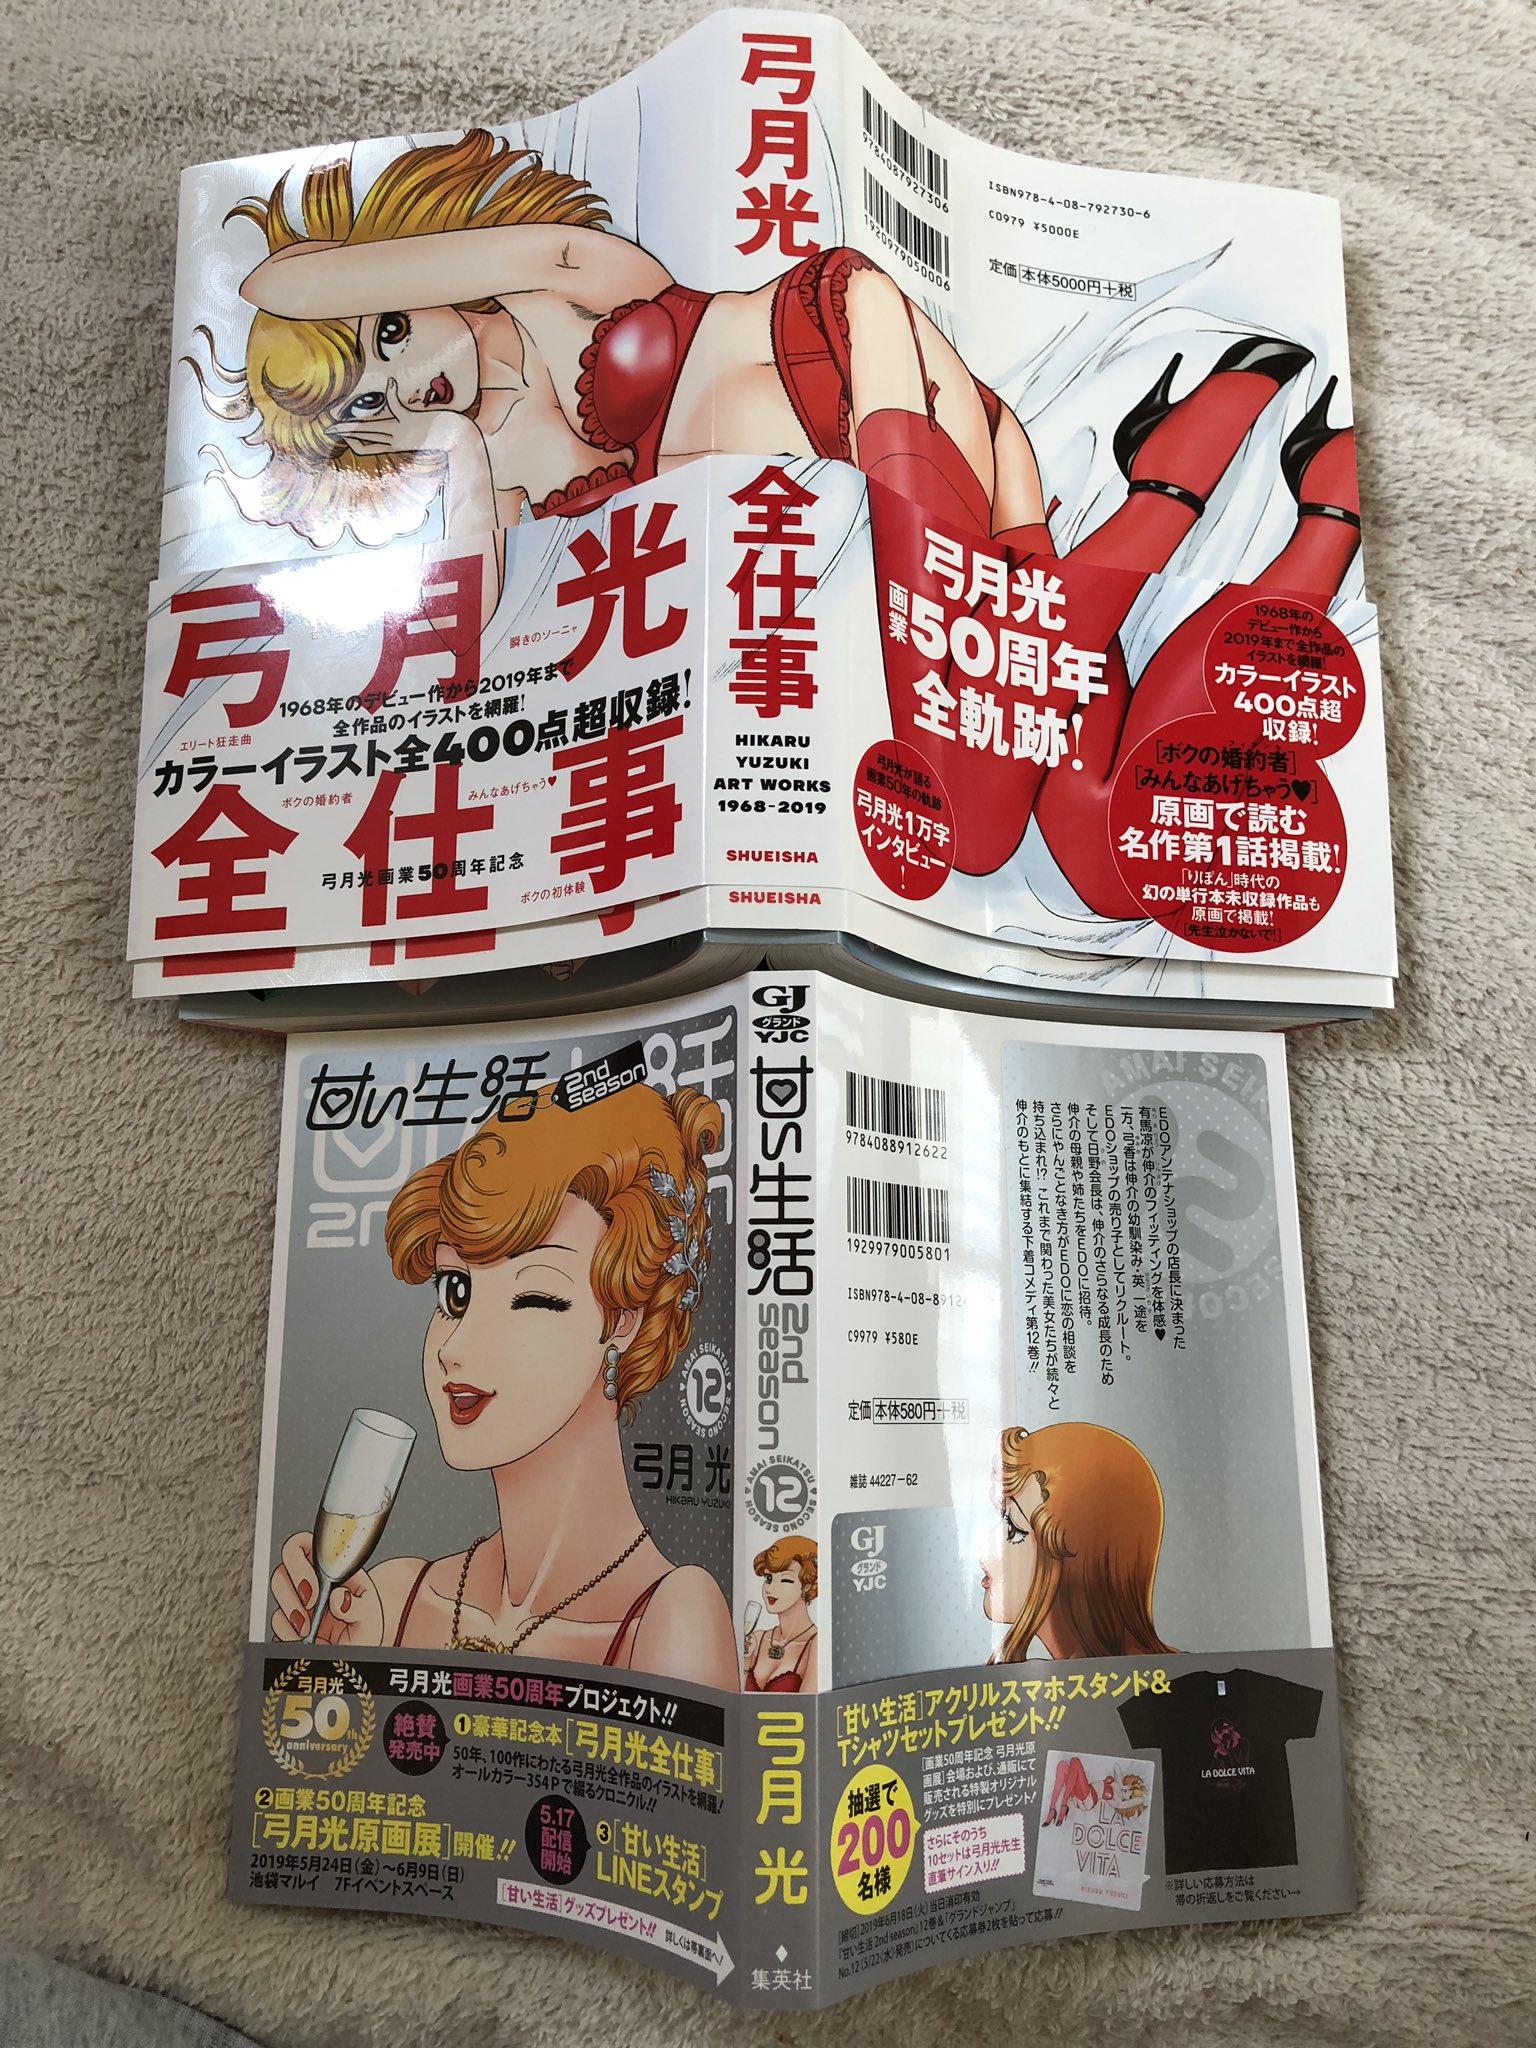 14 2nd season 甘い 巻 日 生活 発売